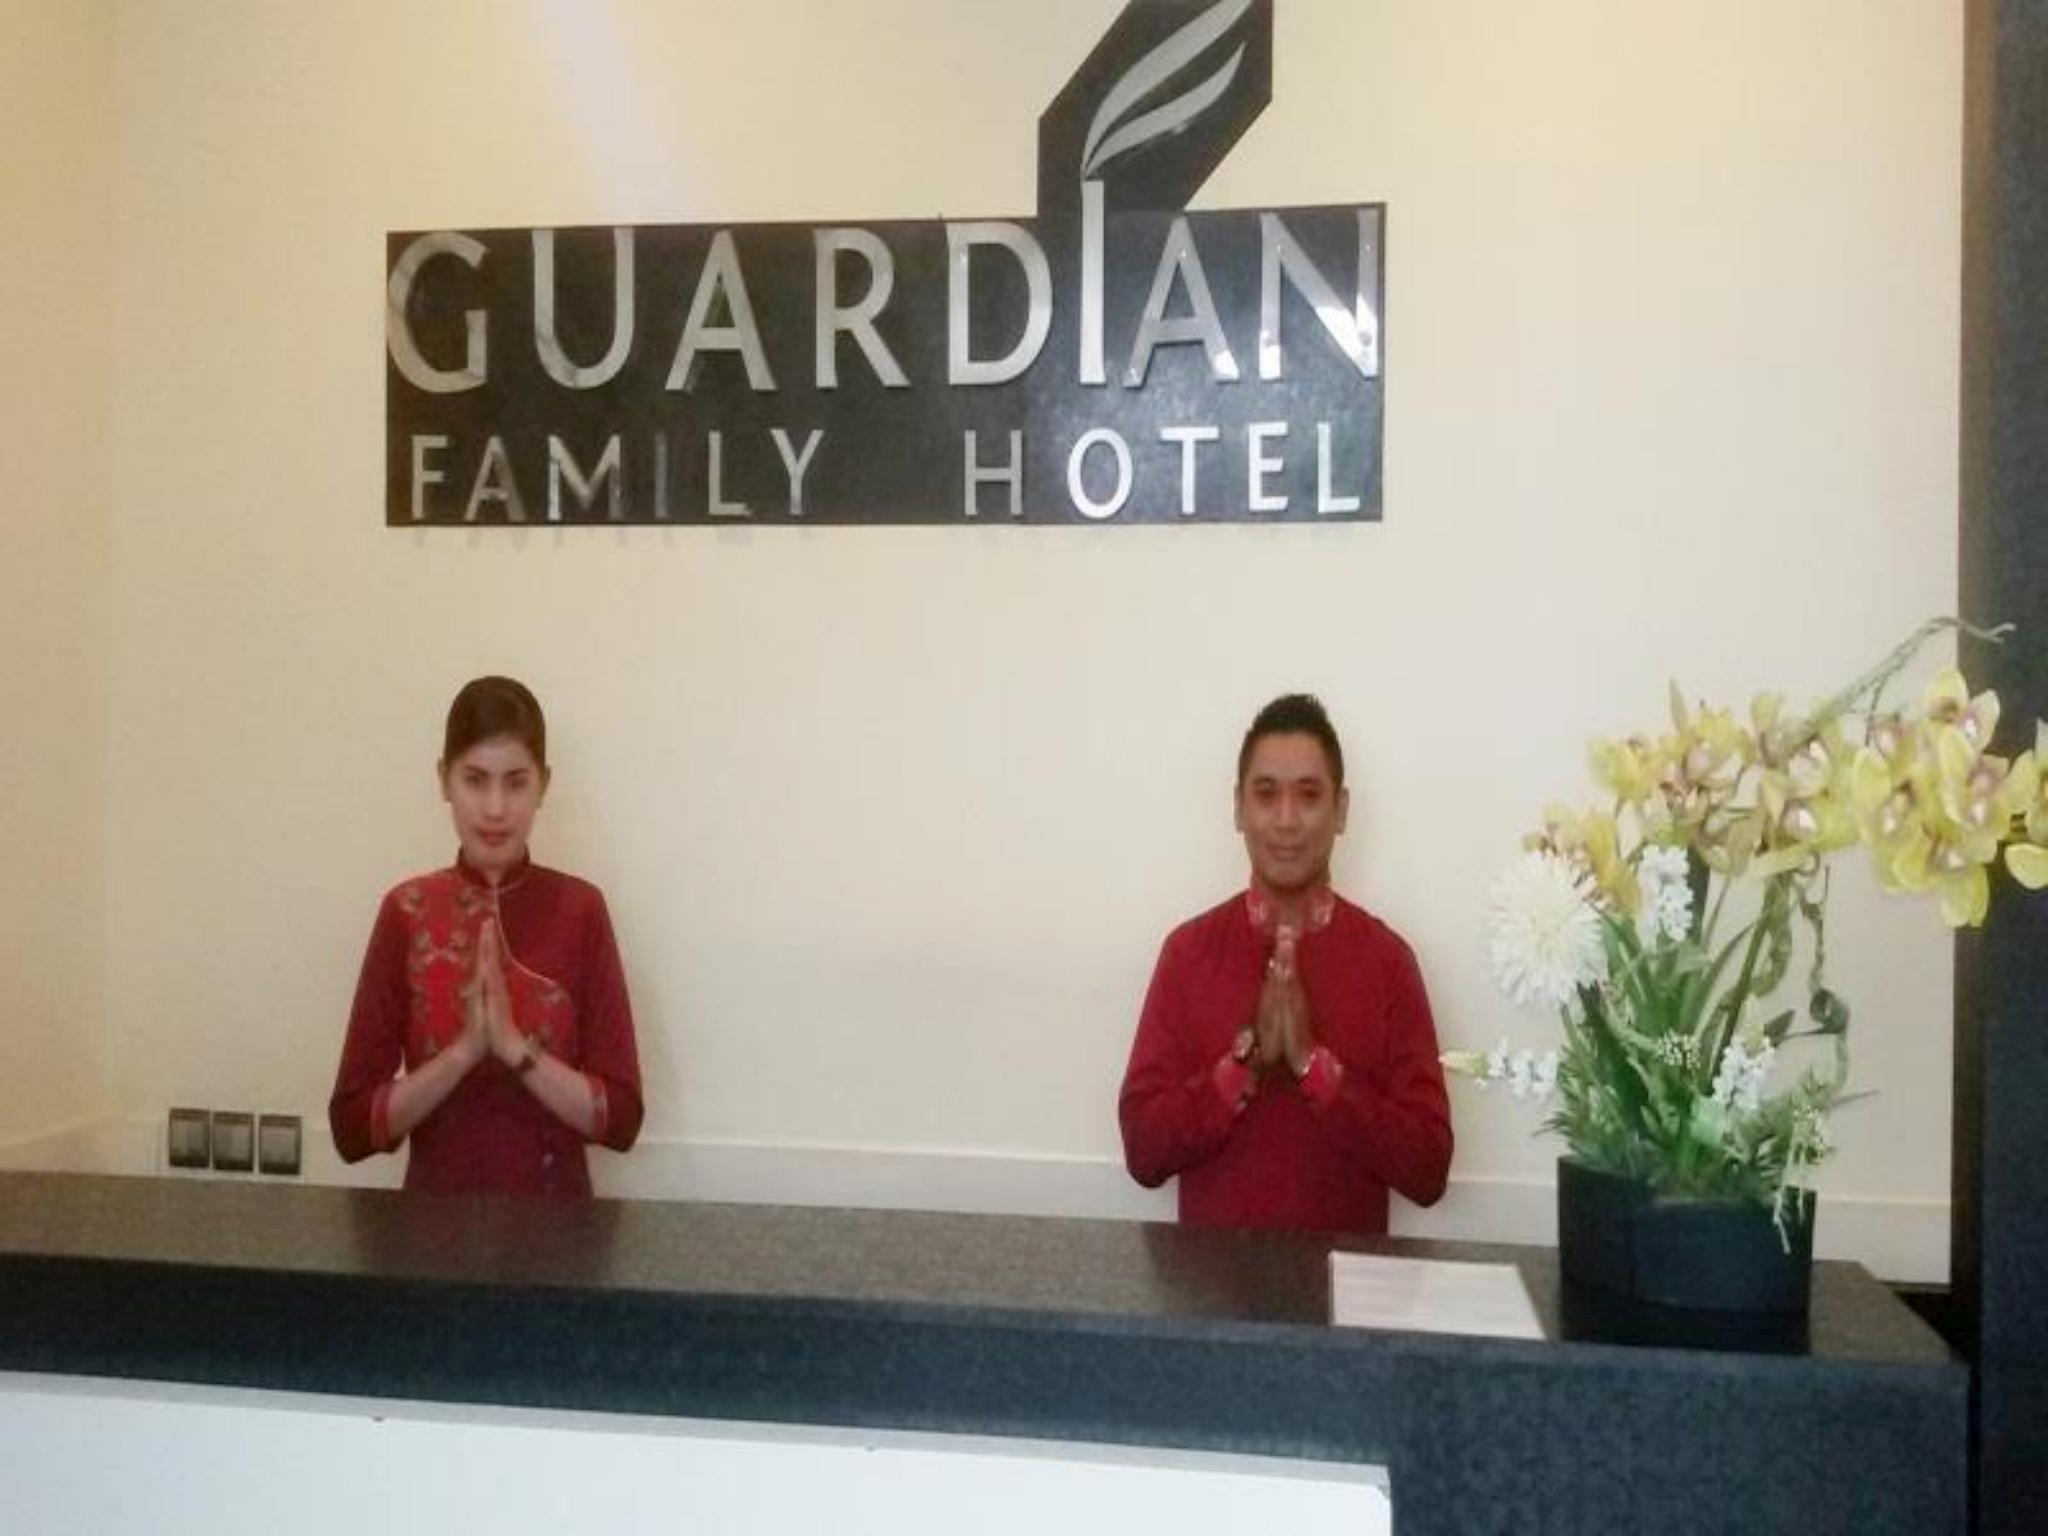 Guardian Family Hotel